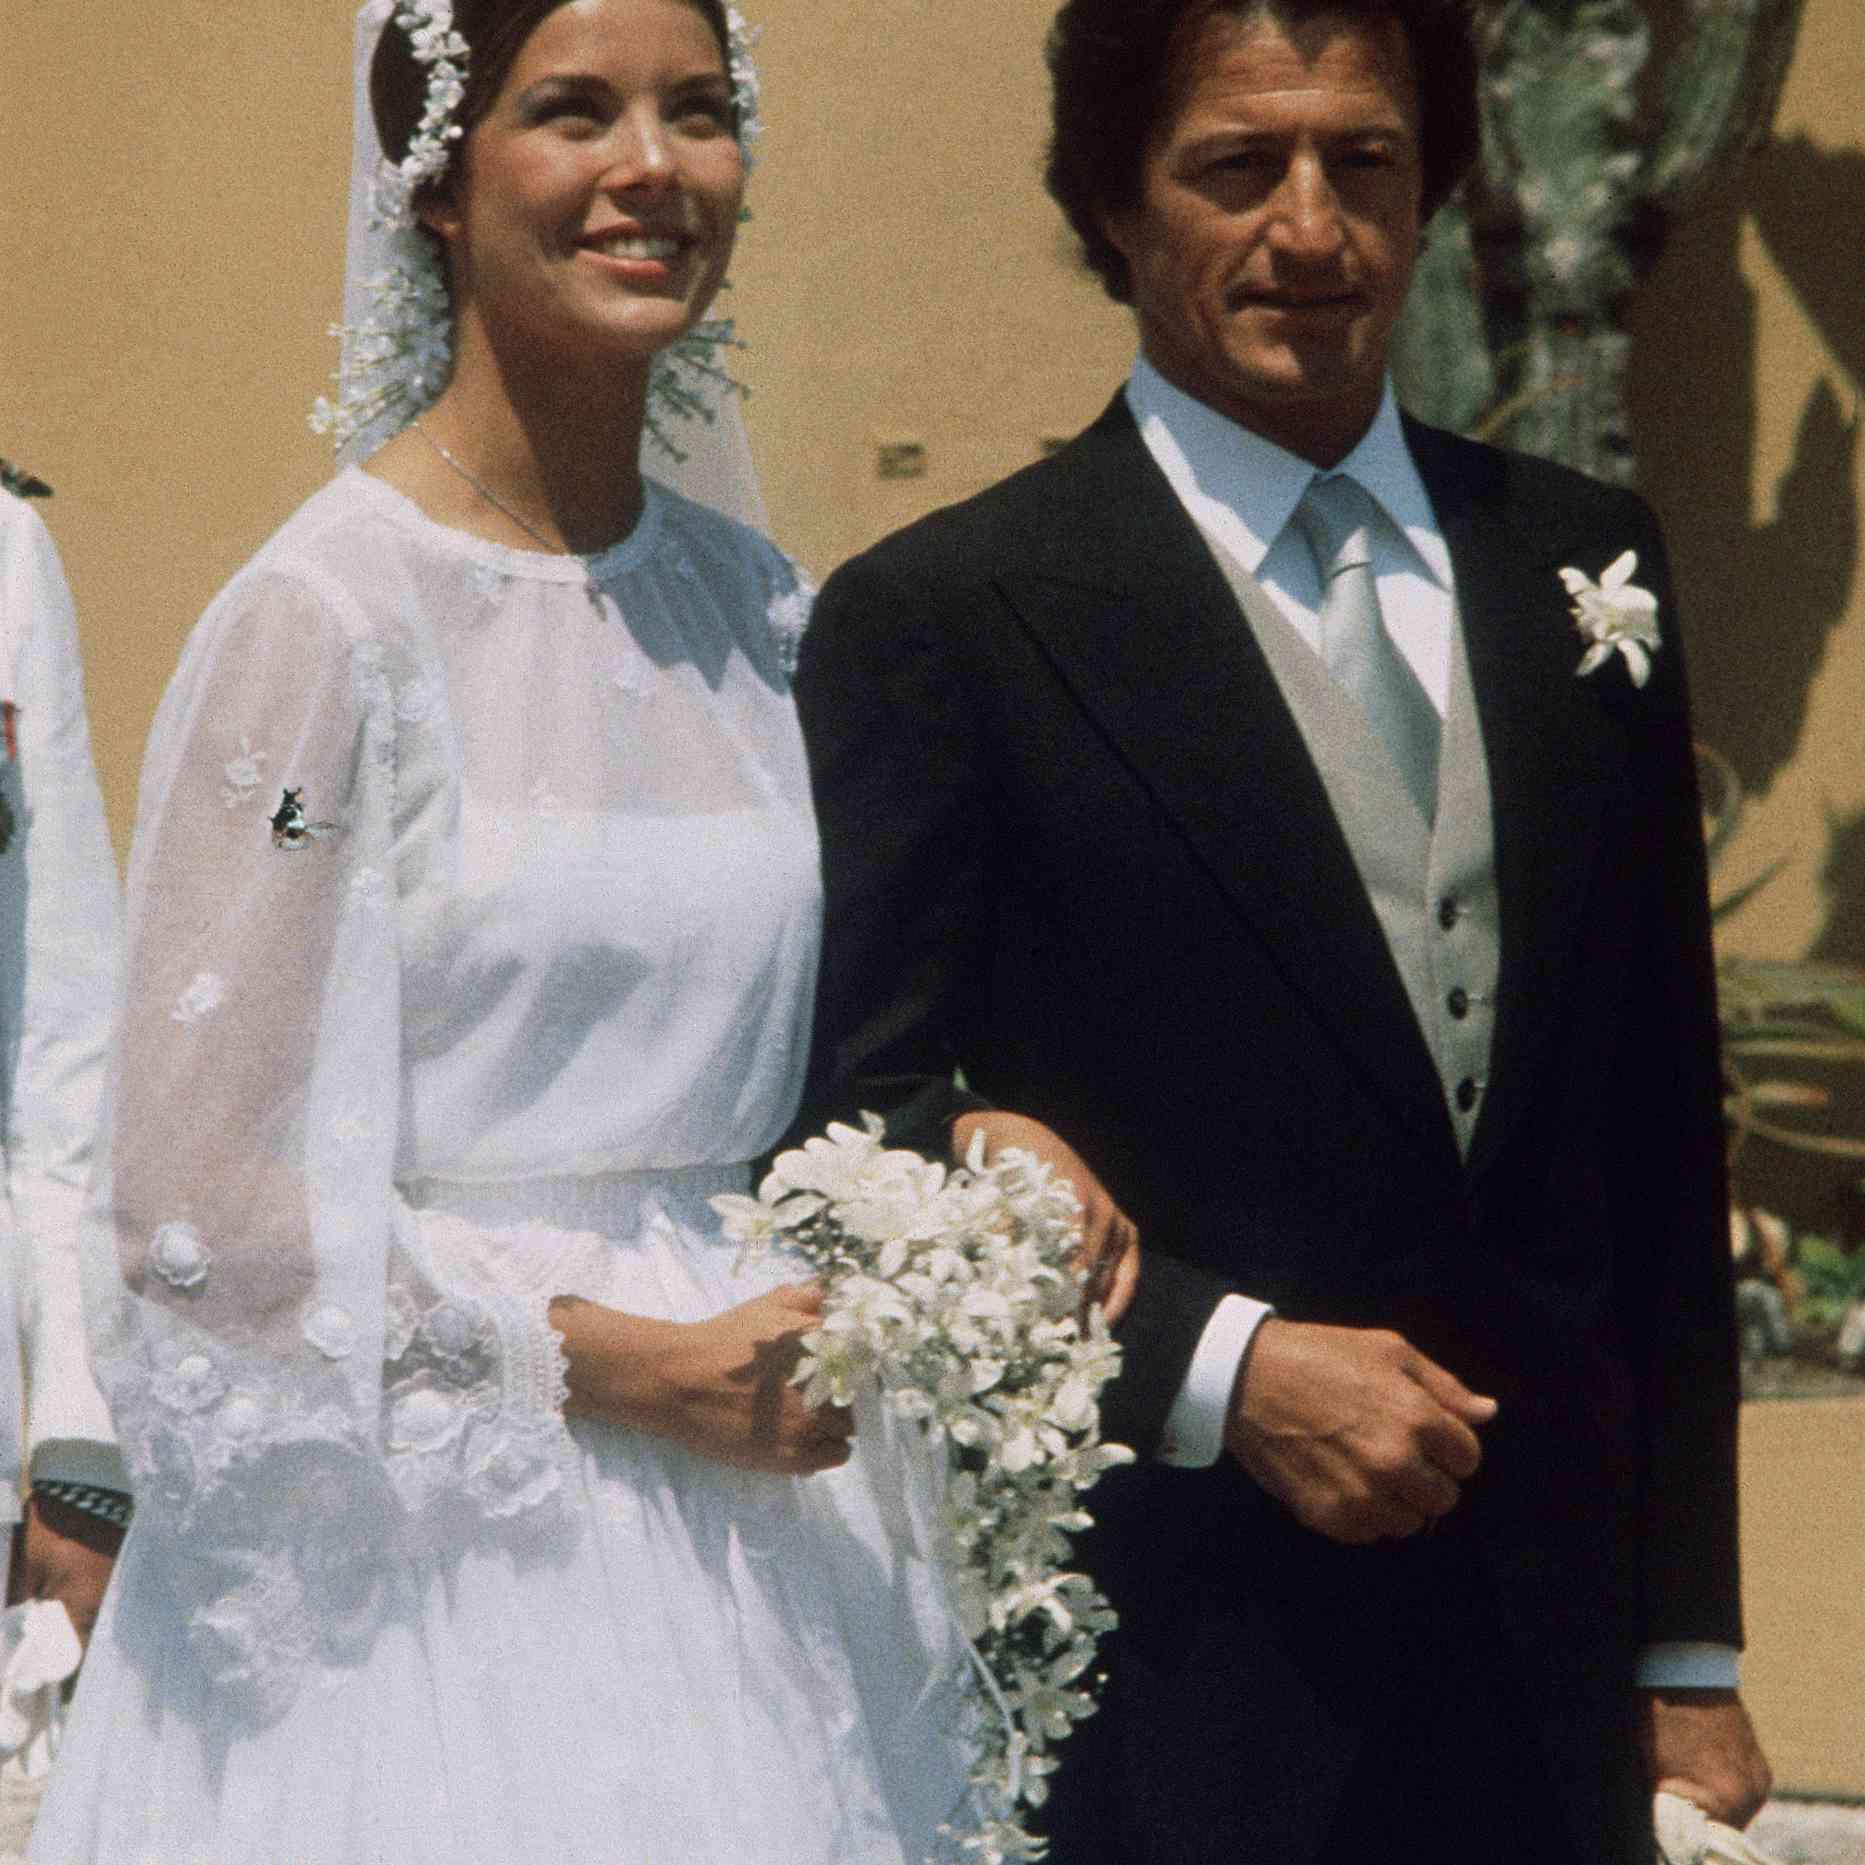 Princess Caroline of Monaco on her wedding day